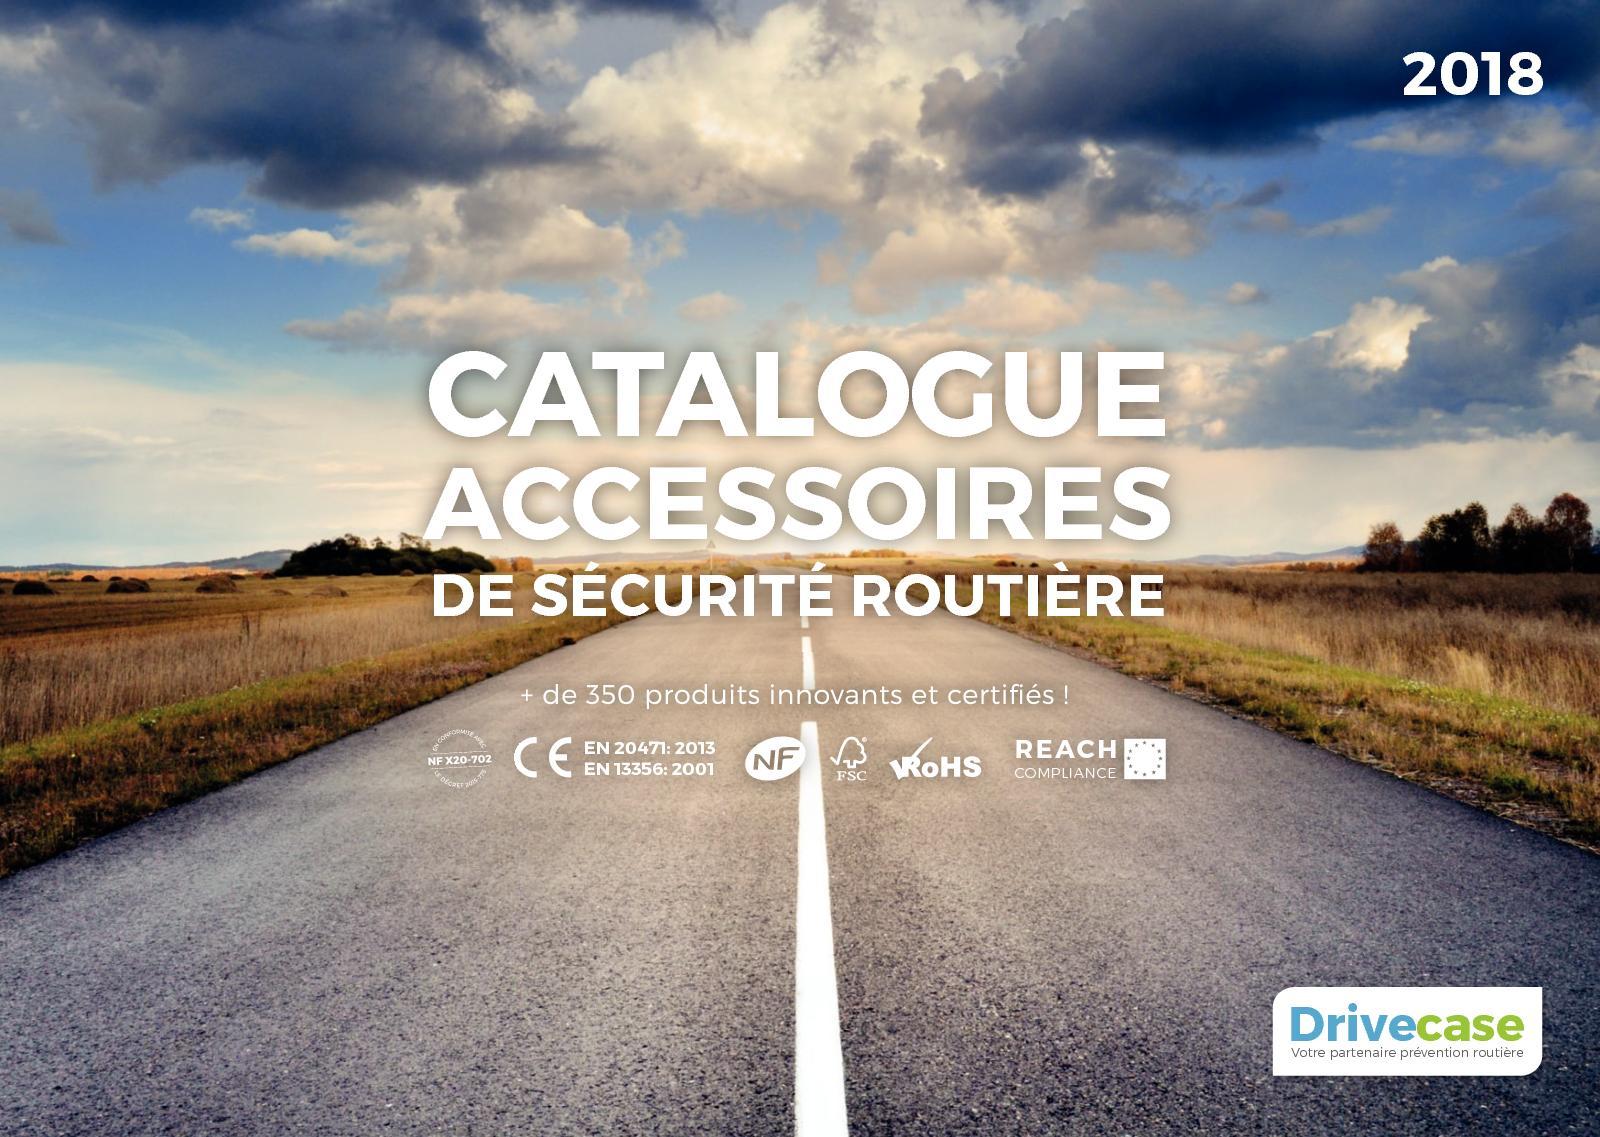 ddfdeb3b9938ab Calaméo - Catalogue Accessoires Drivecase 2018